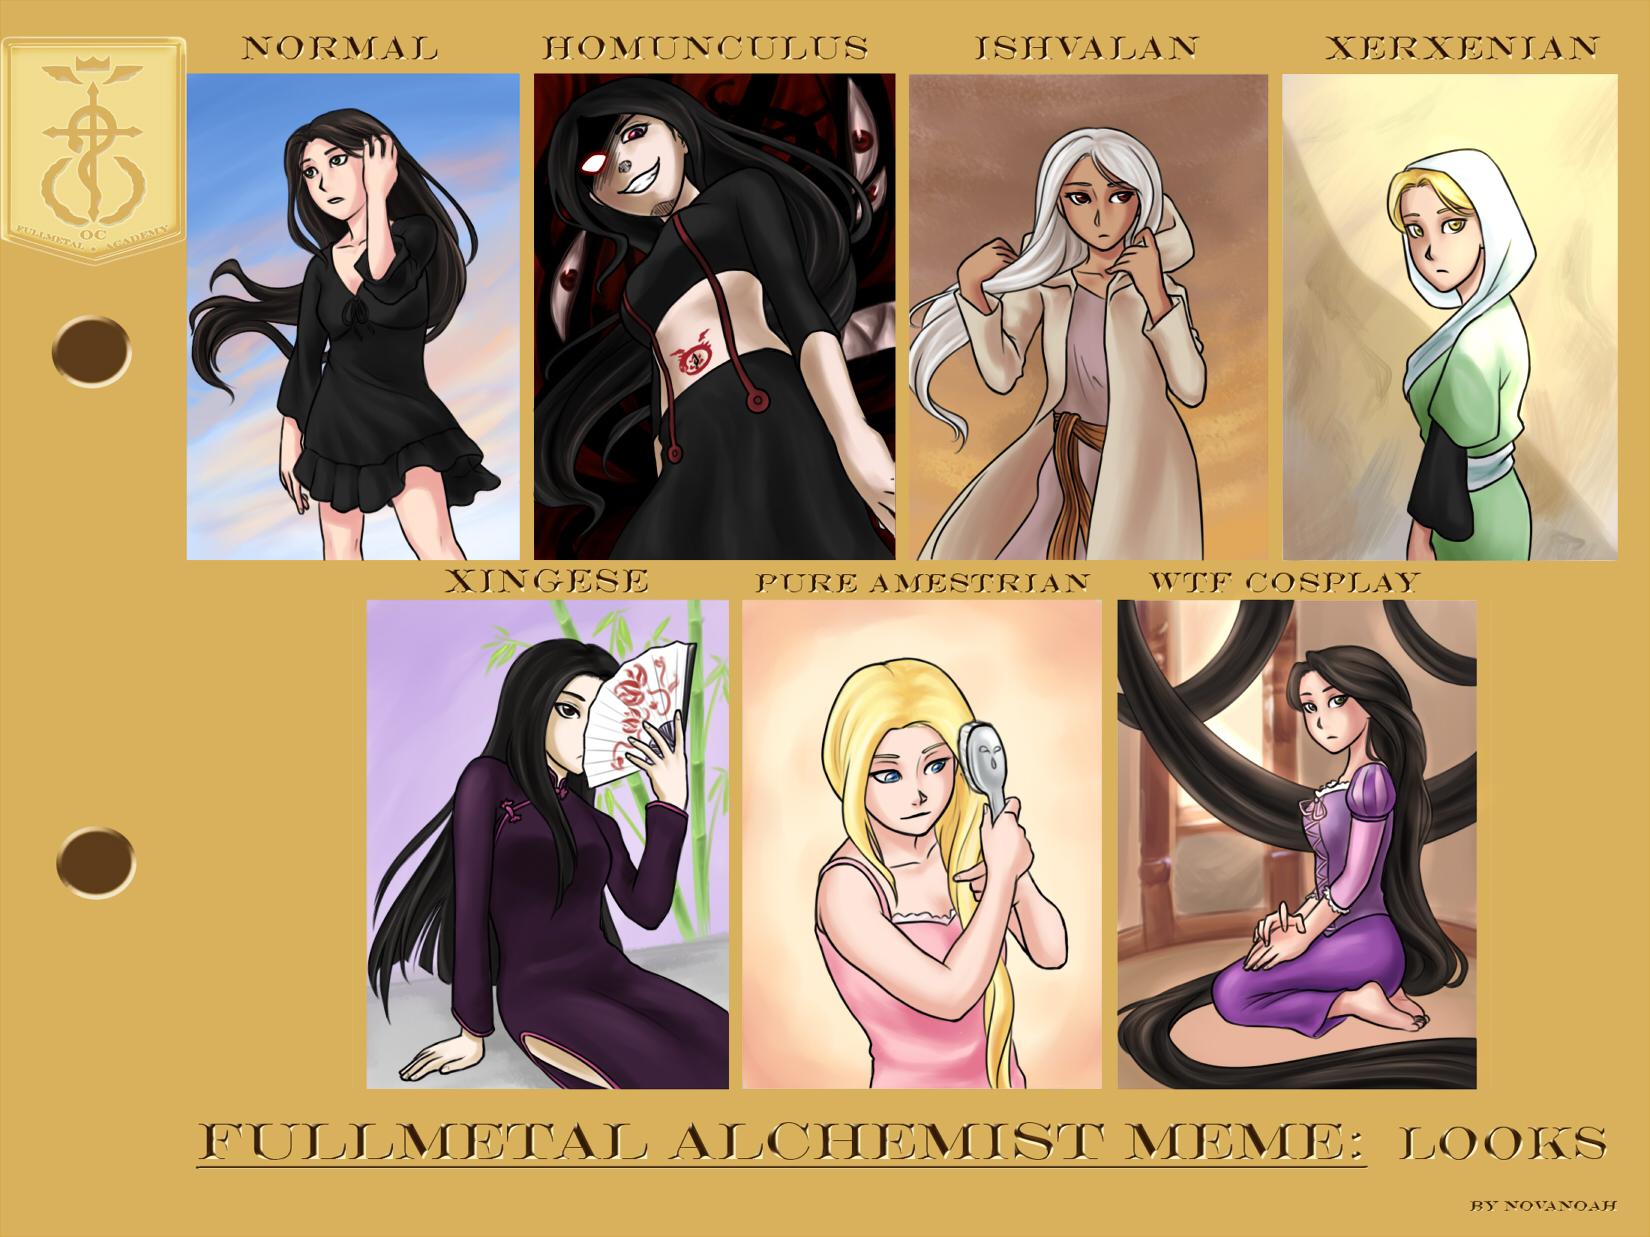 Fullmetal Alchemist Homunculus Oc Template Pictures To Pin